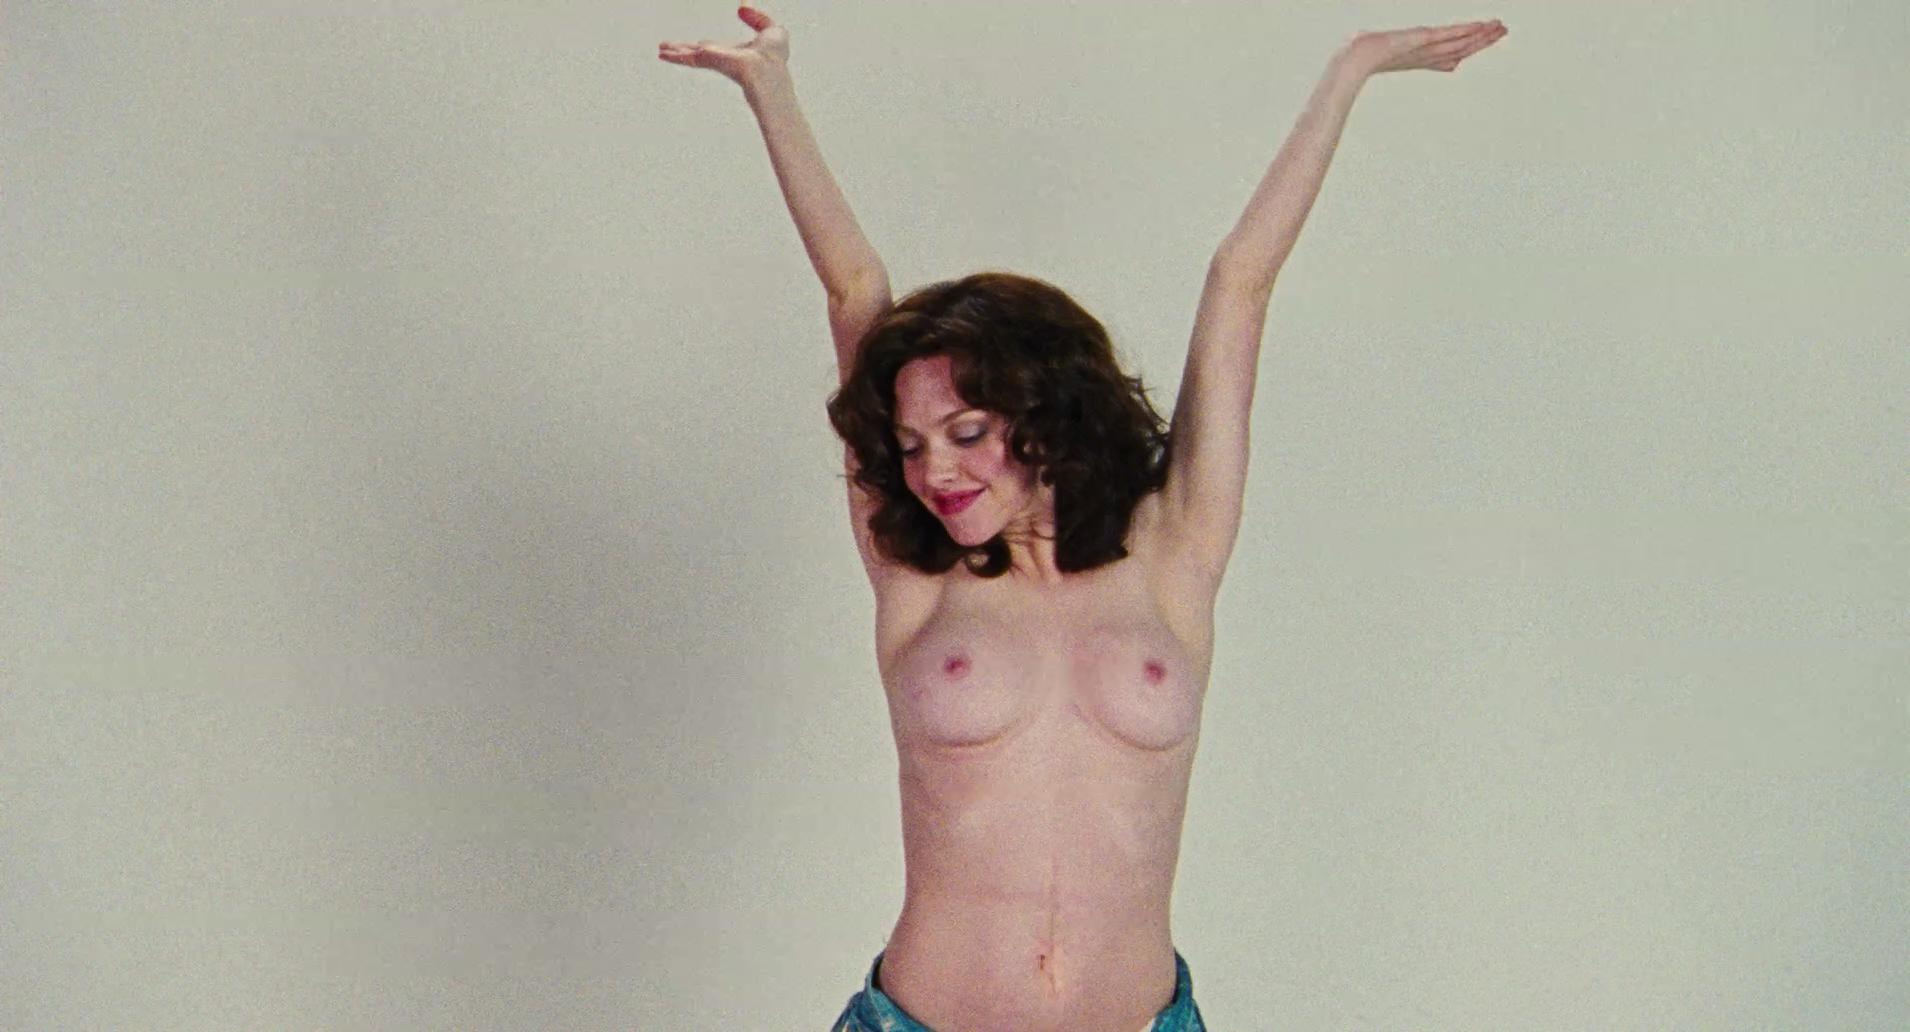 amanda seyfried hot nude